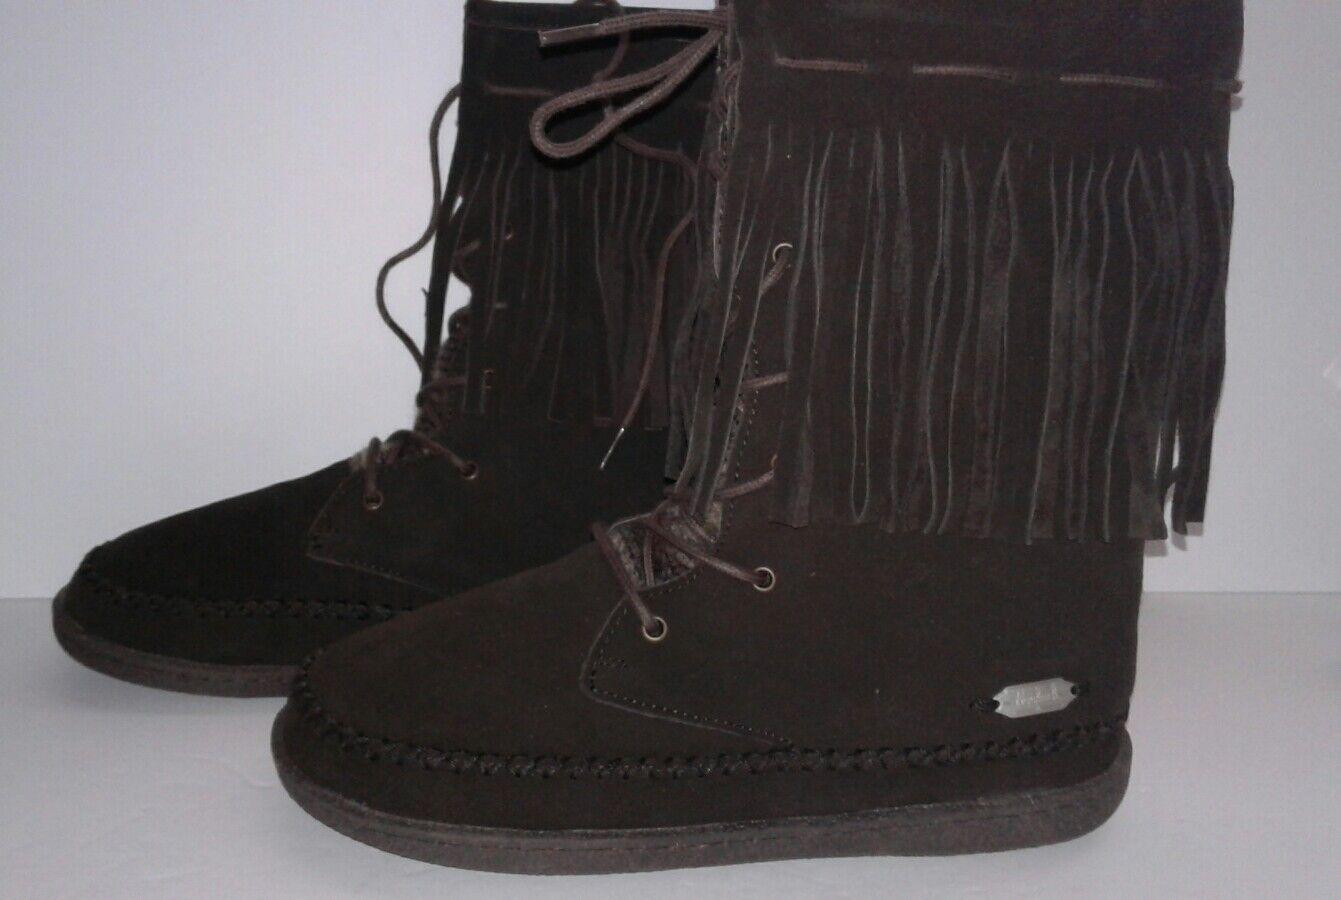 Woolrich Womens Pocono Creek Brown Boots shoes 10 Medium (B,M)